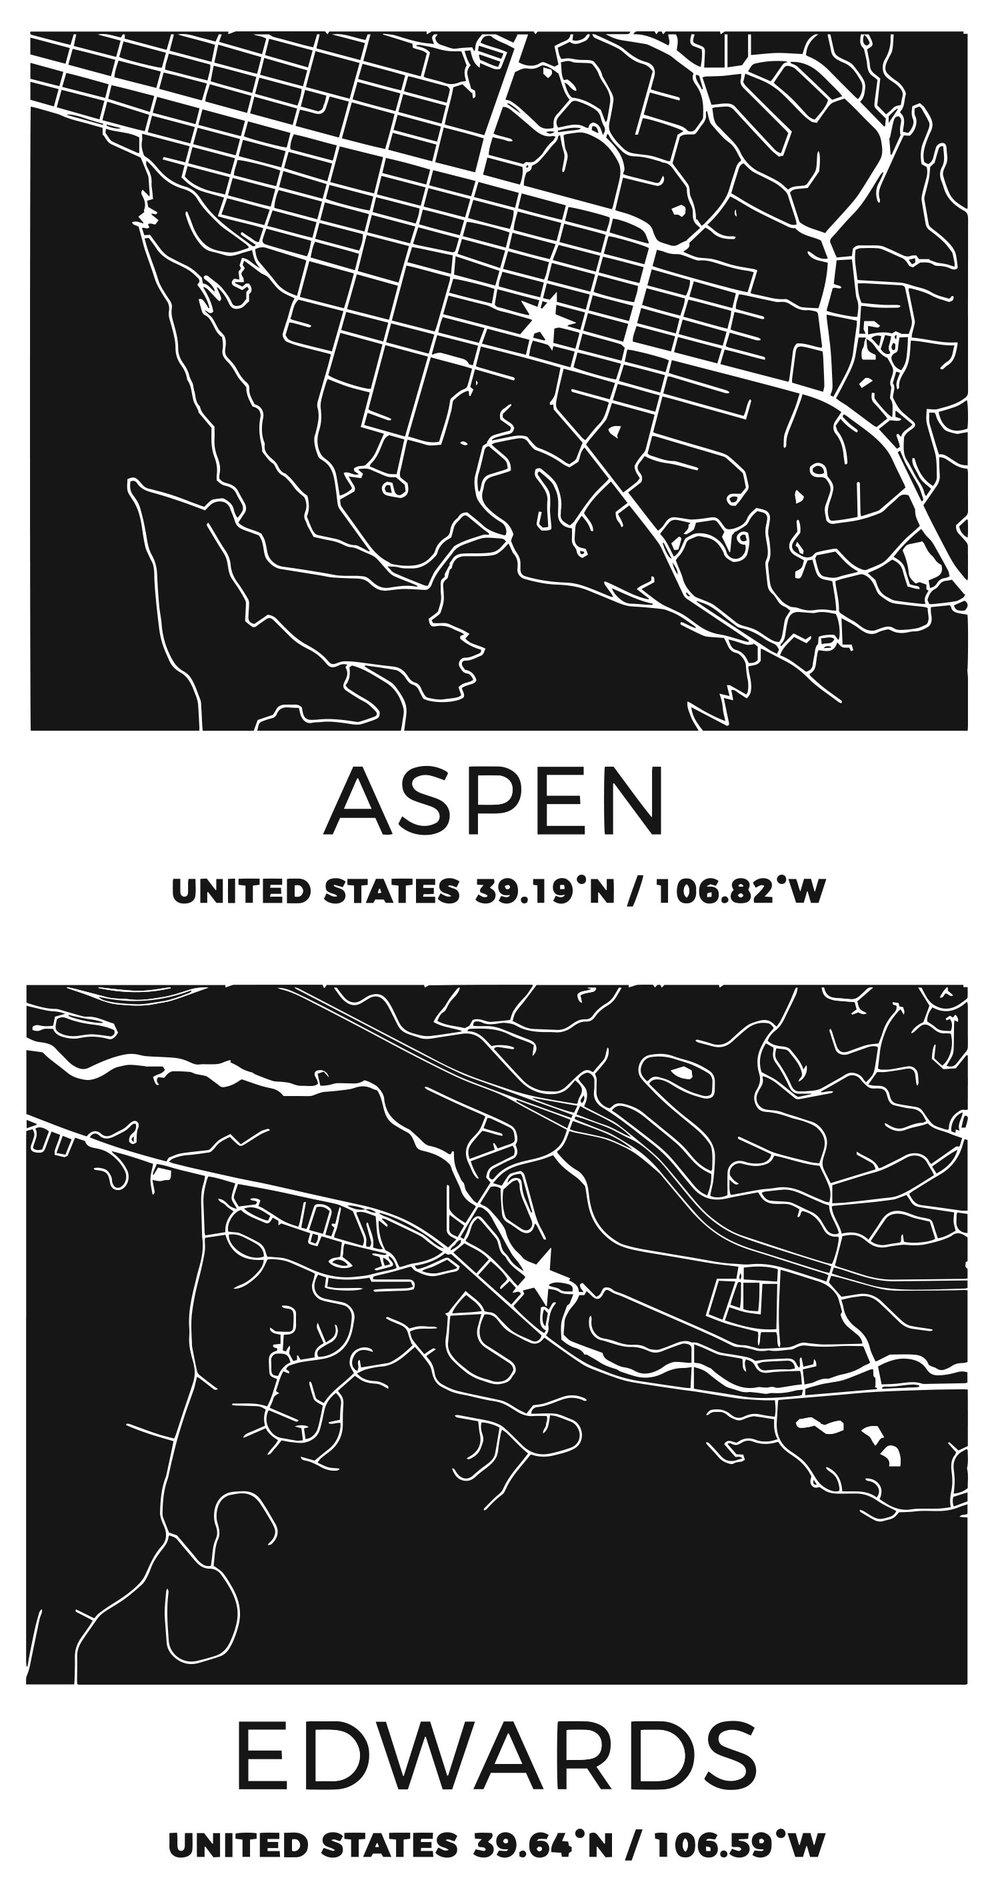 pe101-aspen-edwards-maps.jpg